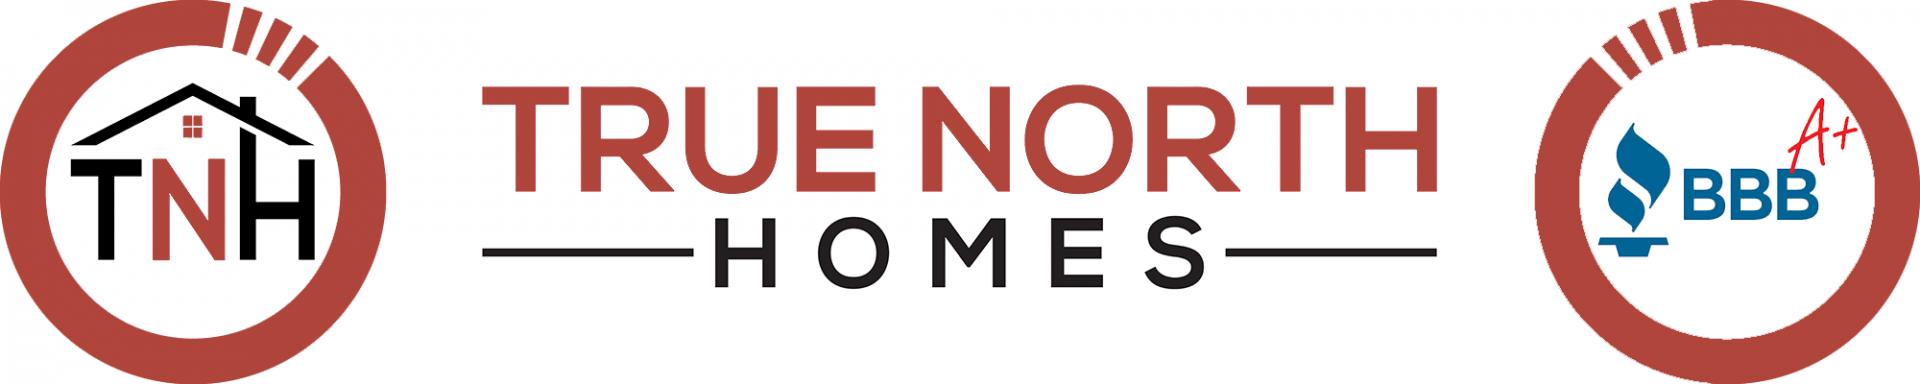 True North Homes logo